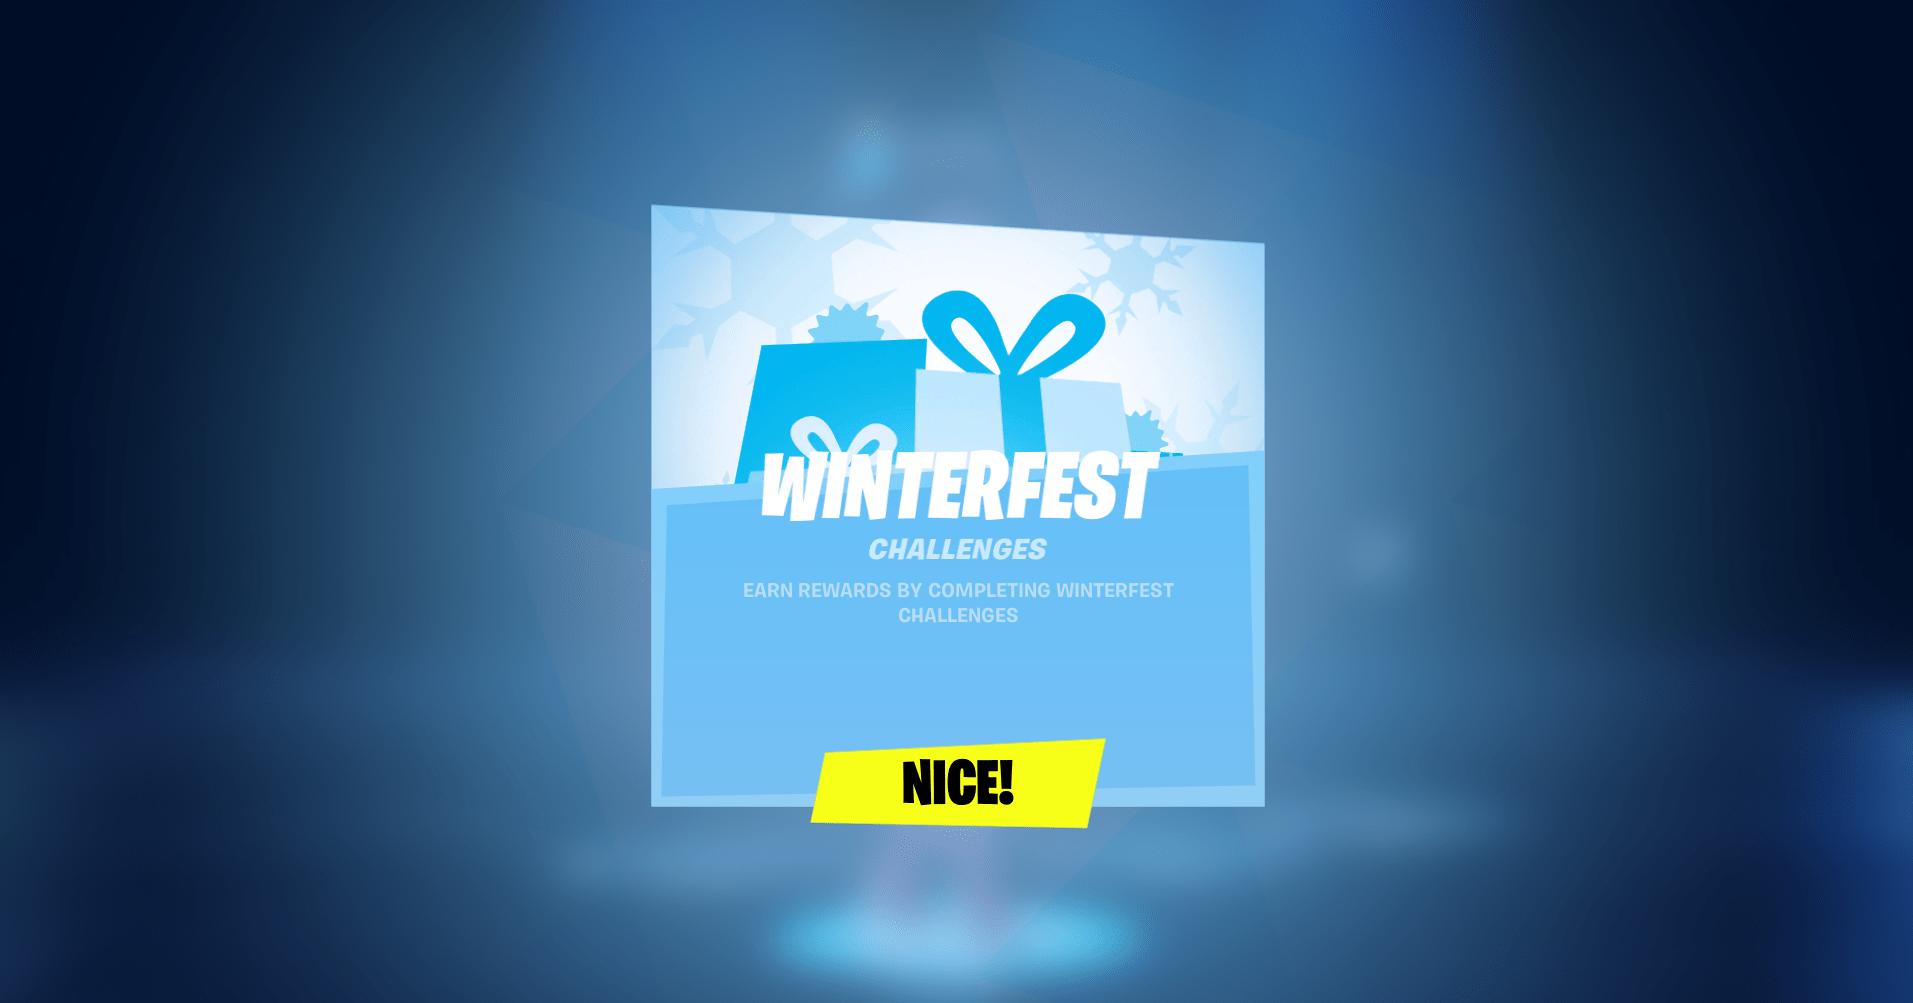 Fortnite Winterfest Event Started